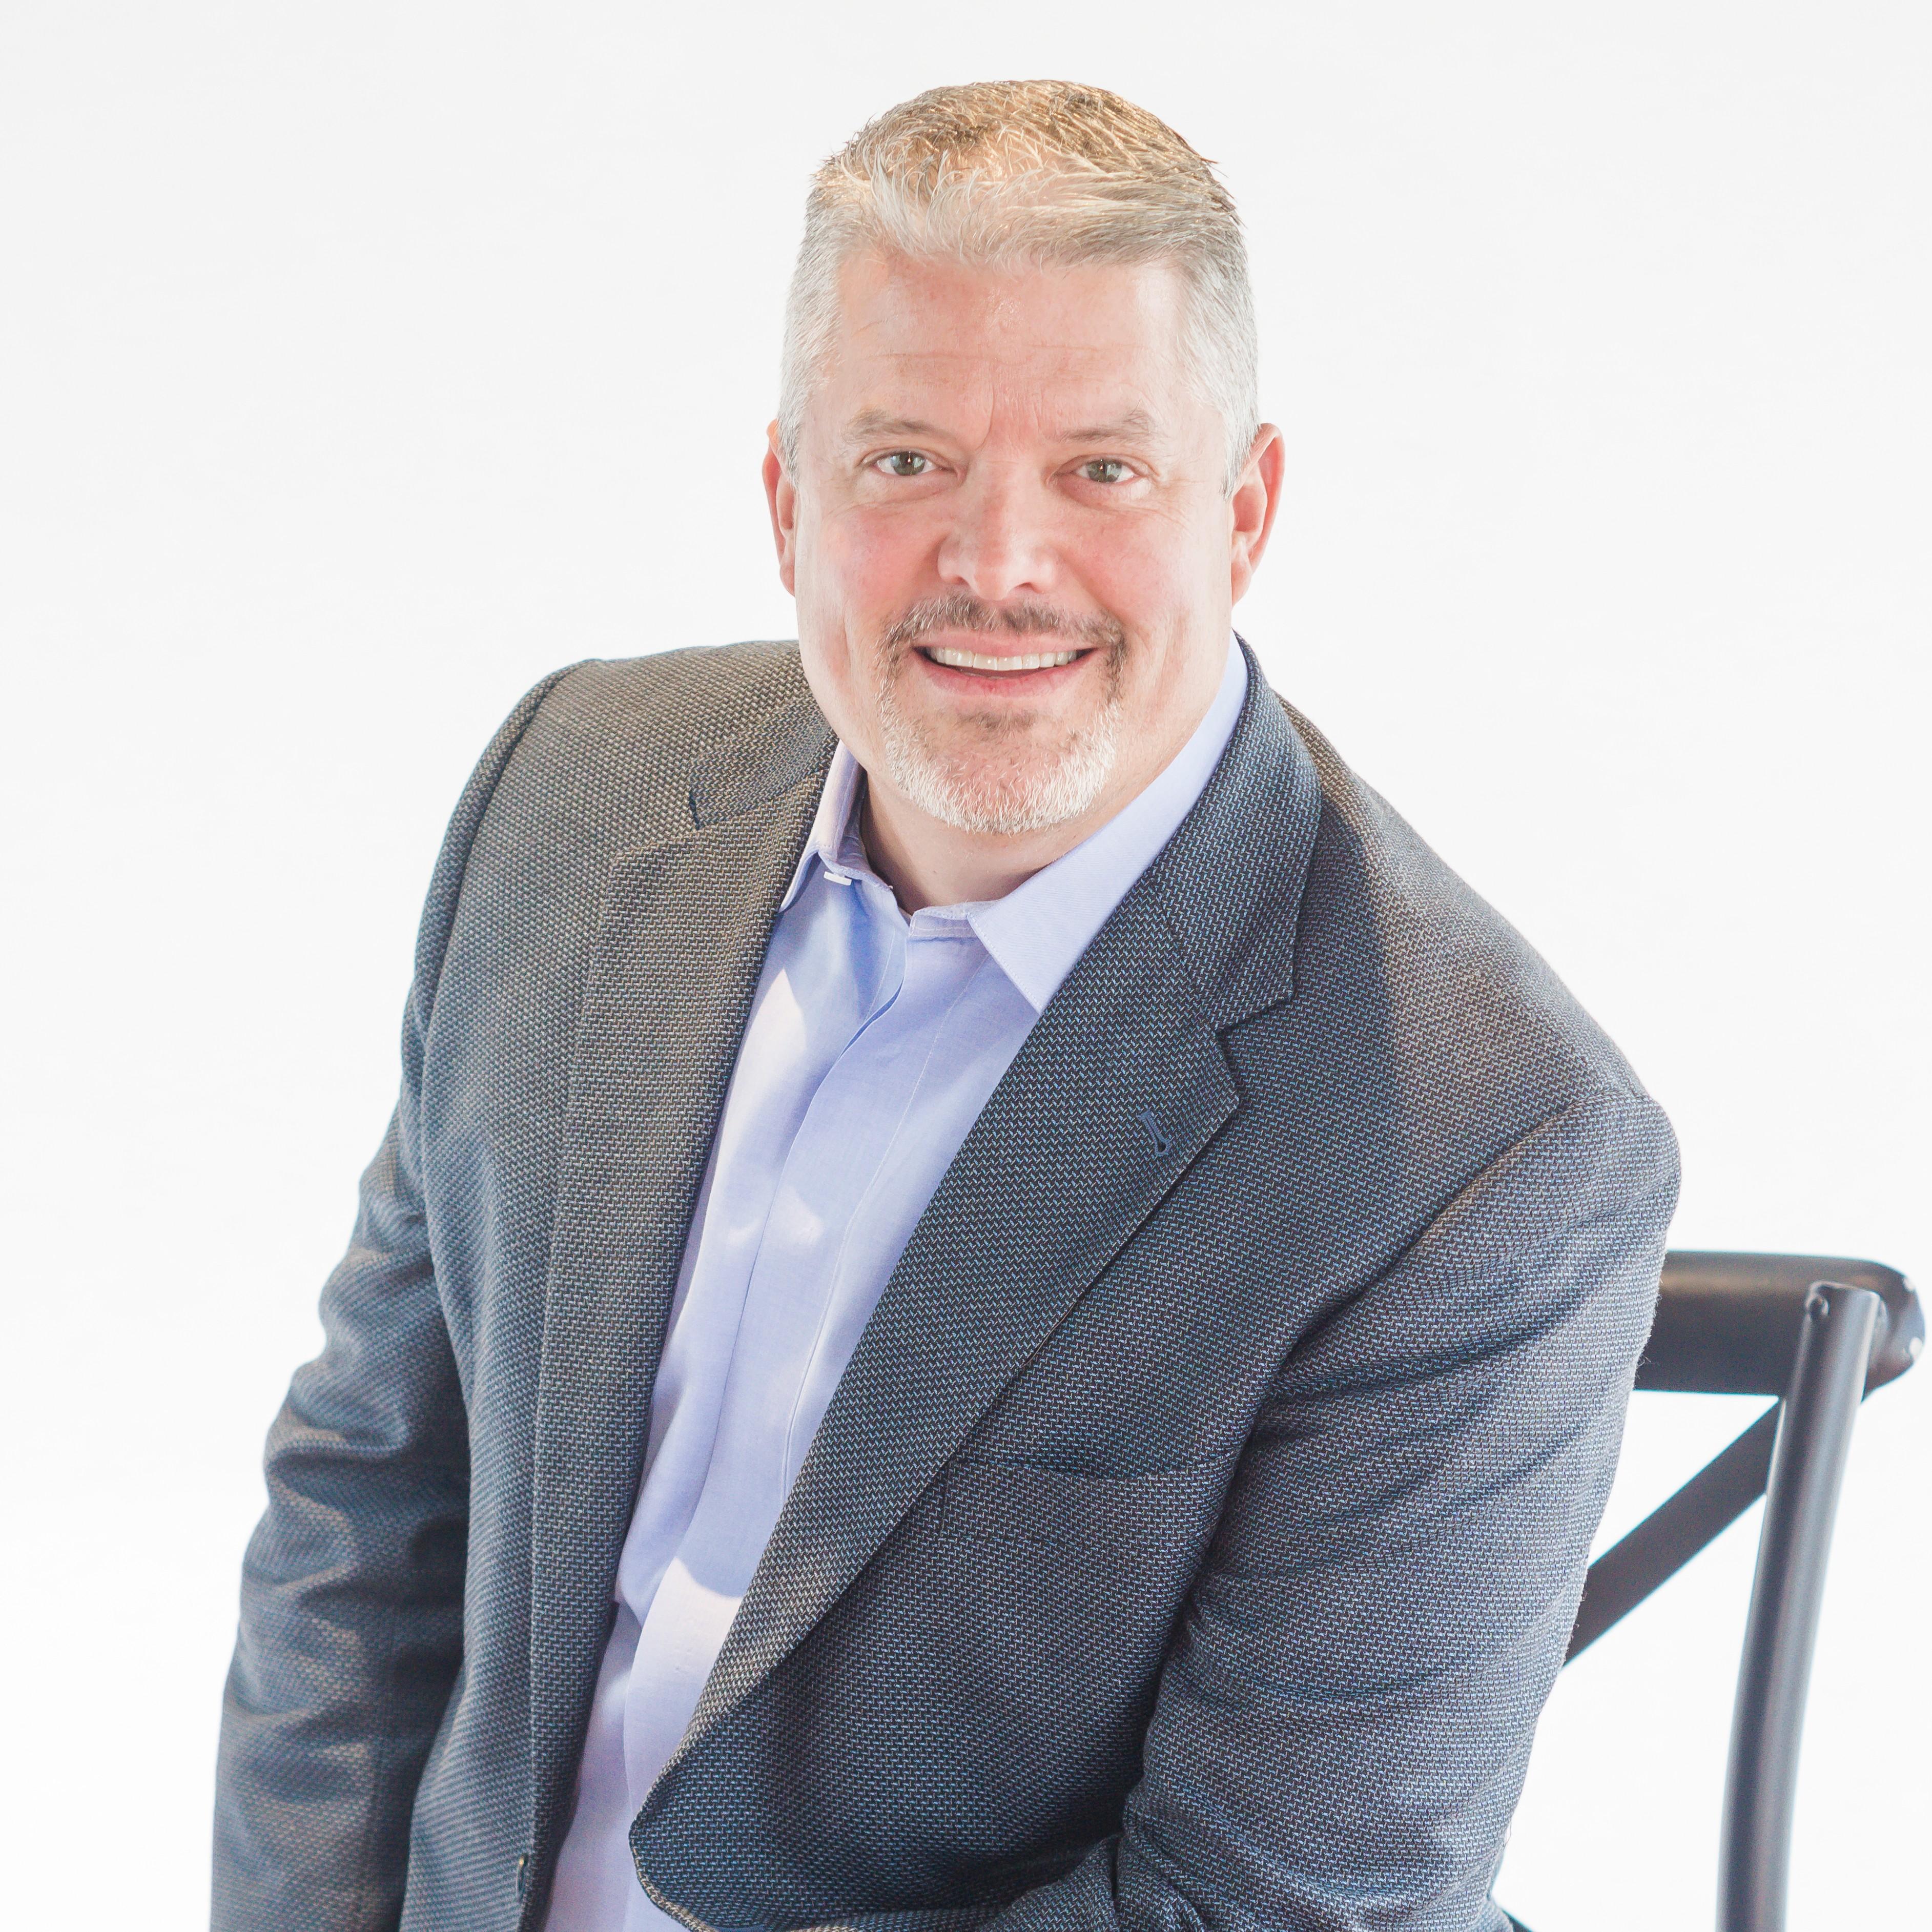 Jon Fleming, Managing Director, Guidacent